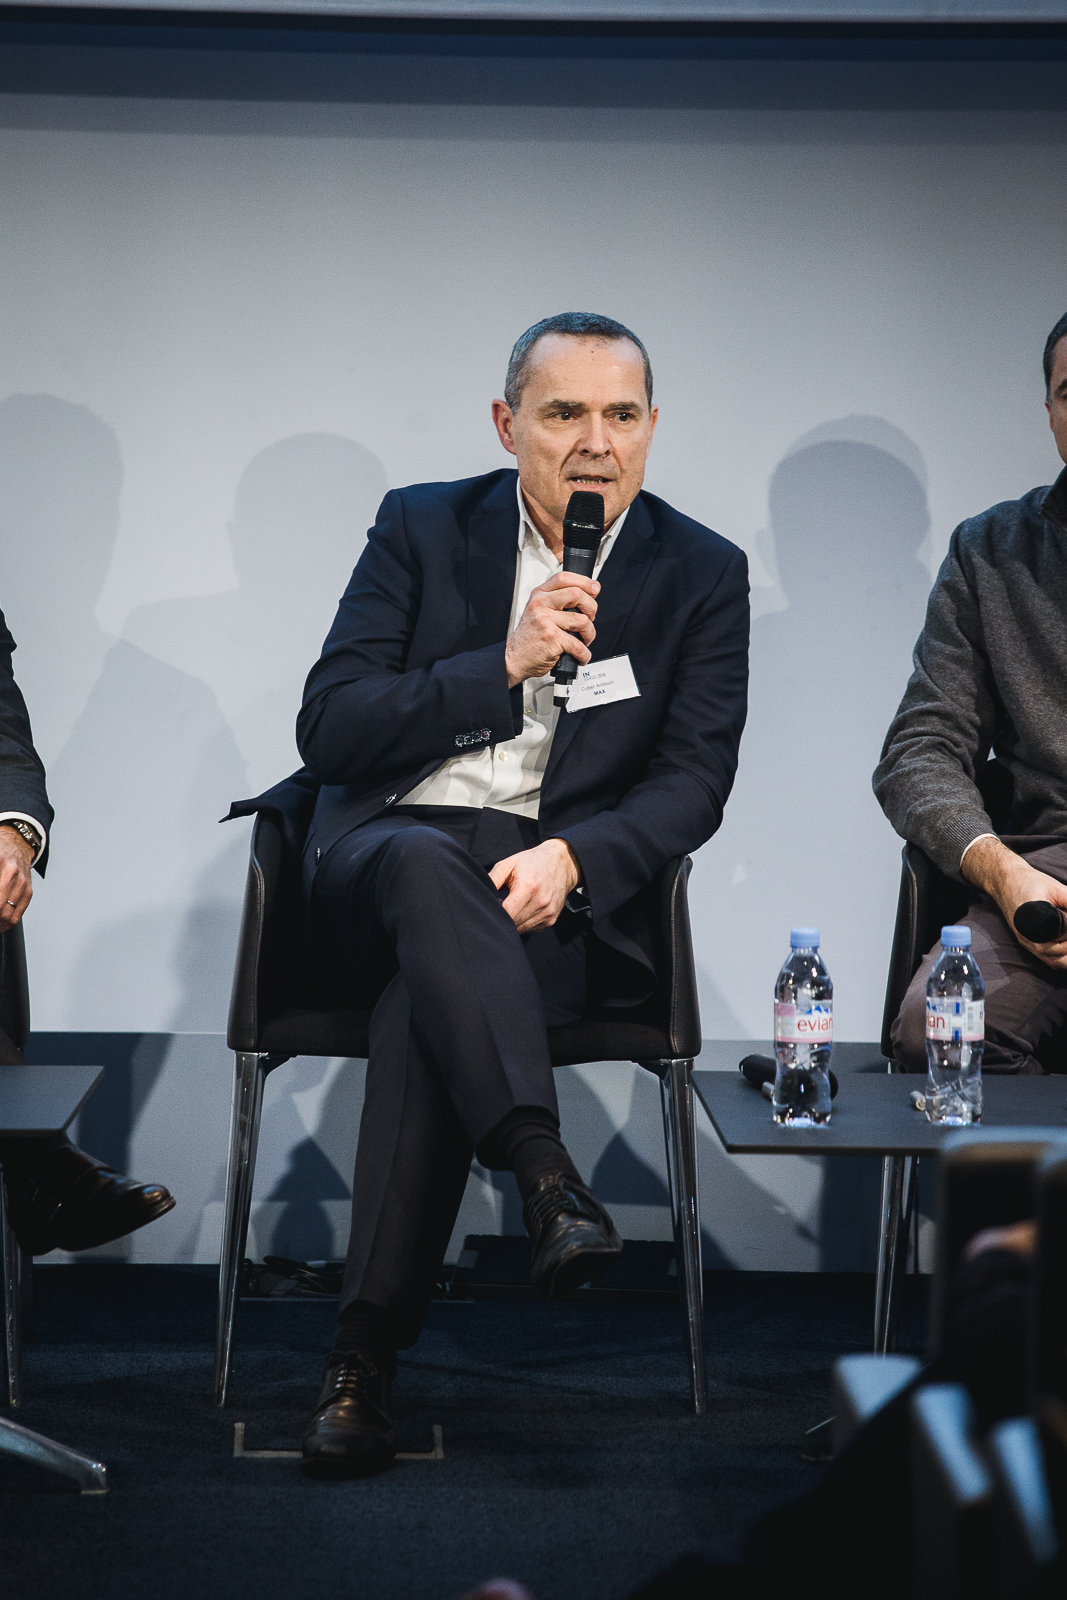 Didier Ardouin (Max, Crédit Mutuel Arkéa) - IN BANQUE 2018 - Crédit photo : Guillermo Gomez